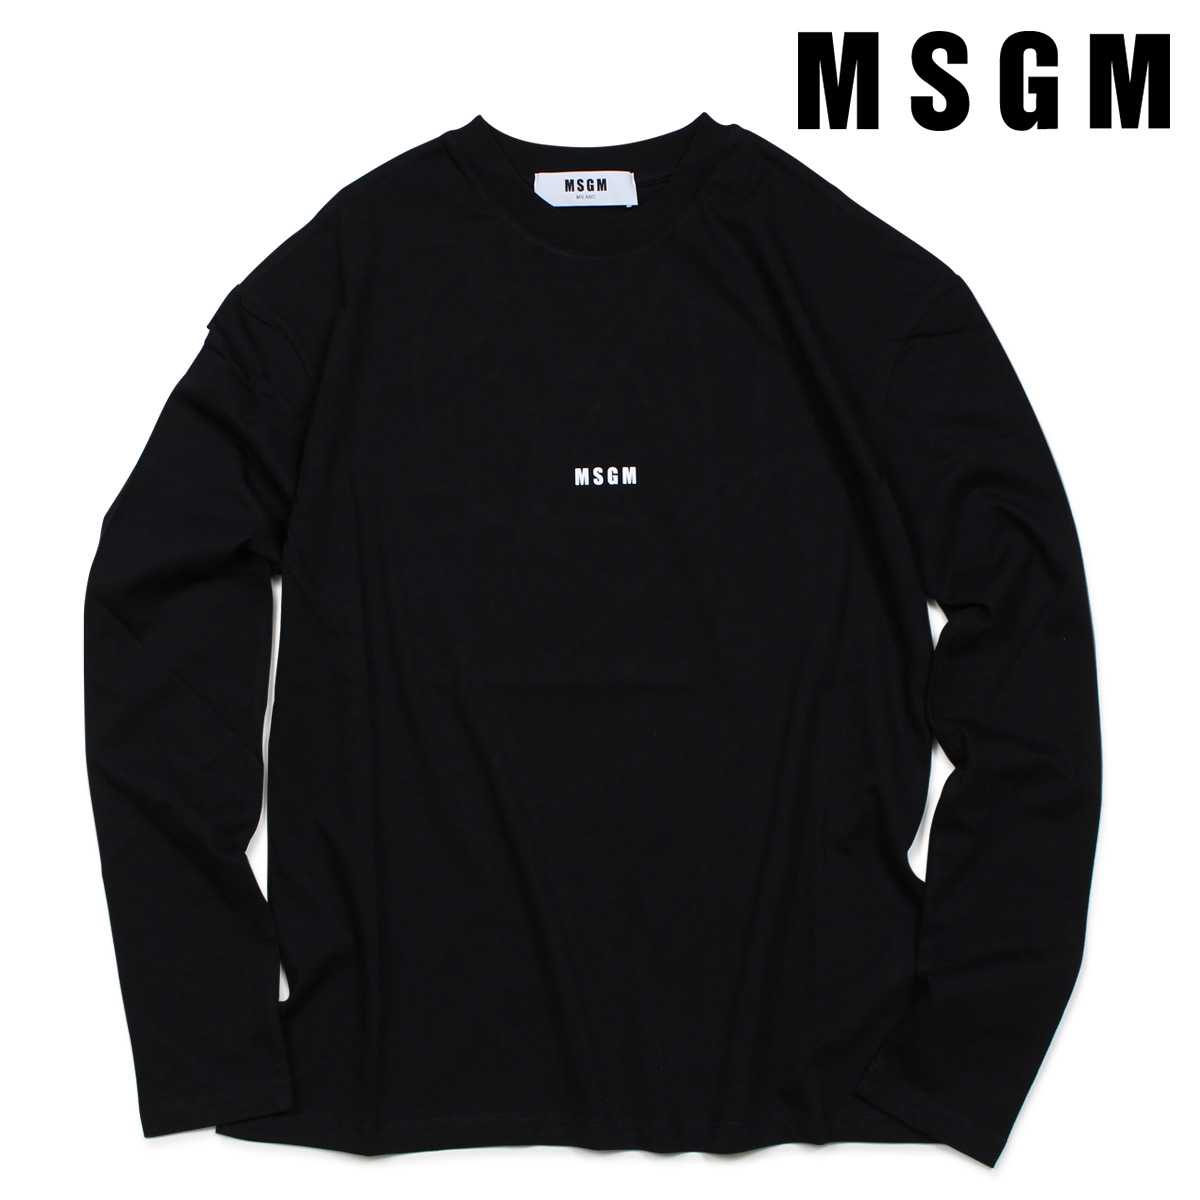 MSGM Tシャツ レディース エムエスジーエム 長袖 ロンT LOGO LONG SLEEVED SHIRTS WITH MICRO LOGO ブラック 2541MDM101 184798 [7/19 新入荷], ミリタリーWAIPER:fc44bc4d --- flets116.jp